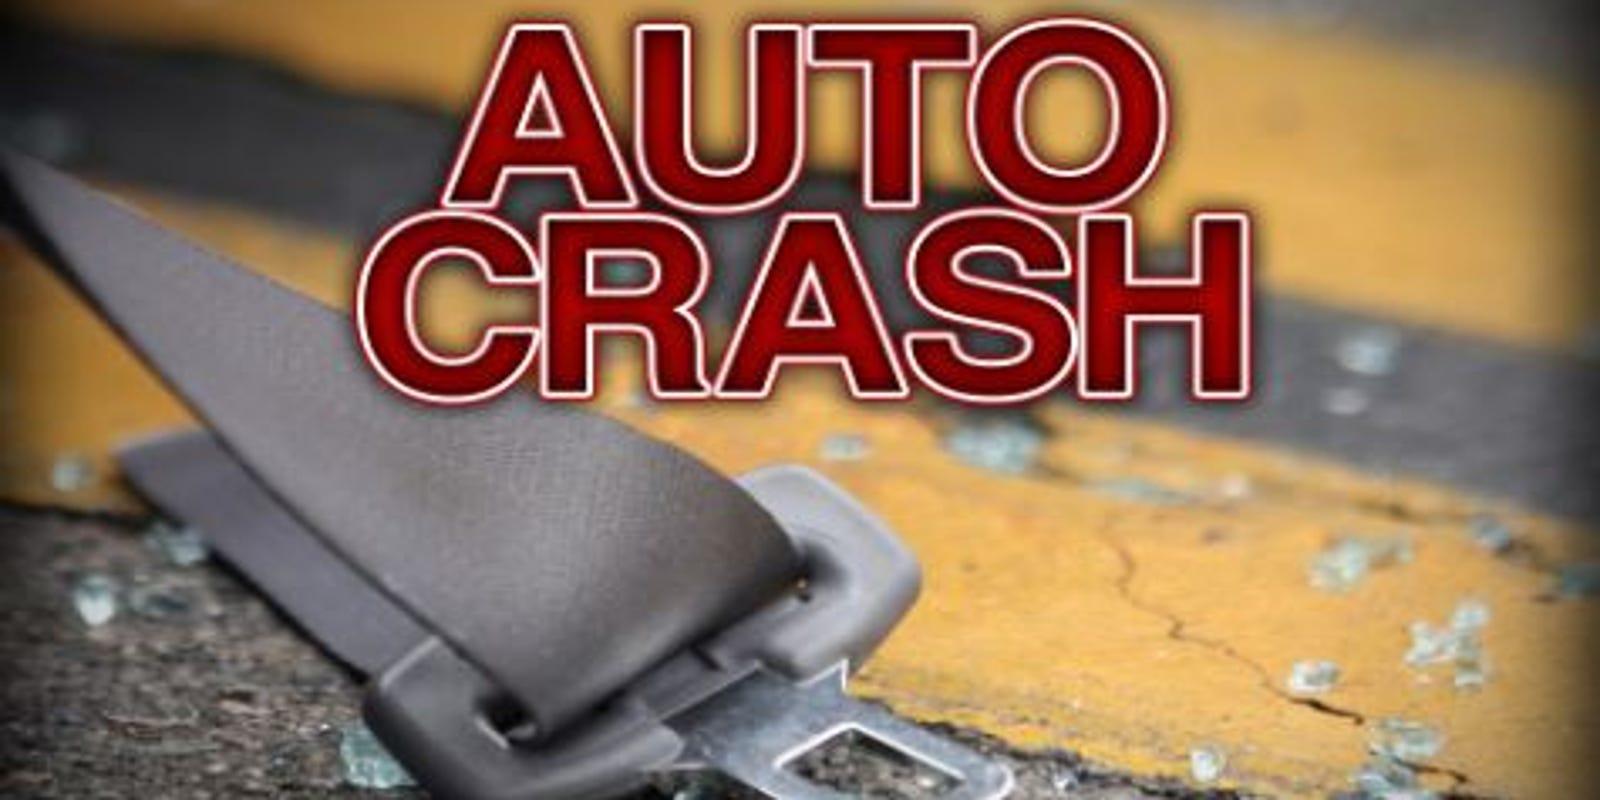 Anderson Stevenson Wilke Funeral 1 killed, 4 injured in crash near montana city